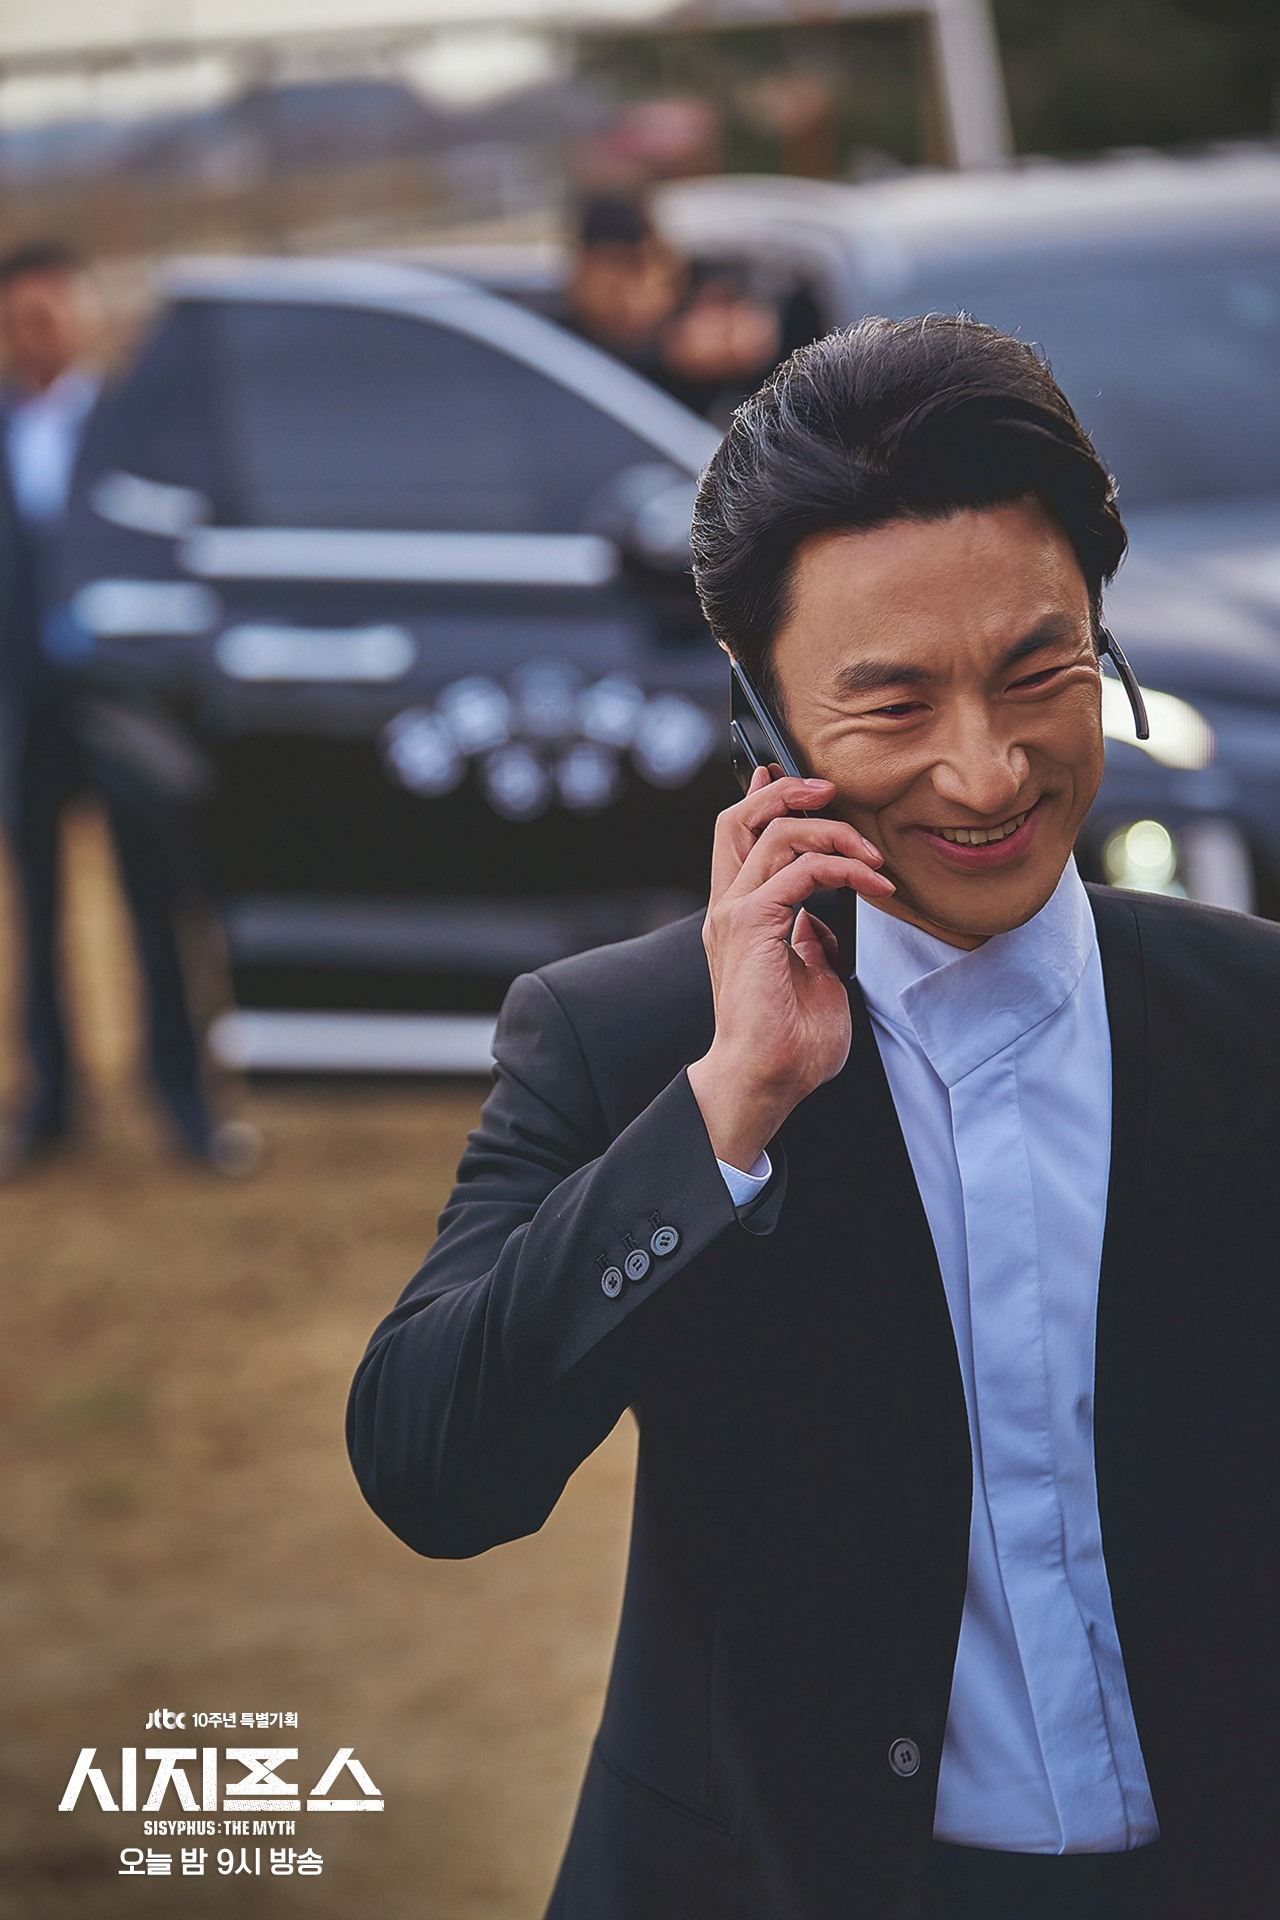 Byeong-cheol Kim in Sijipeuseu: The Myth (2021)